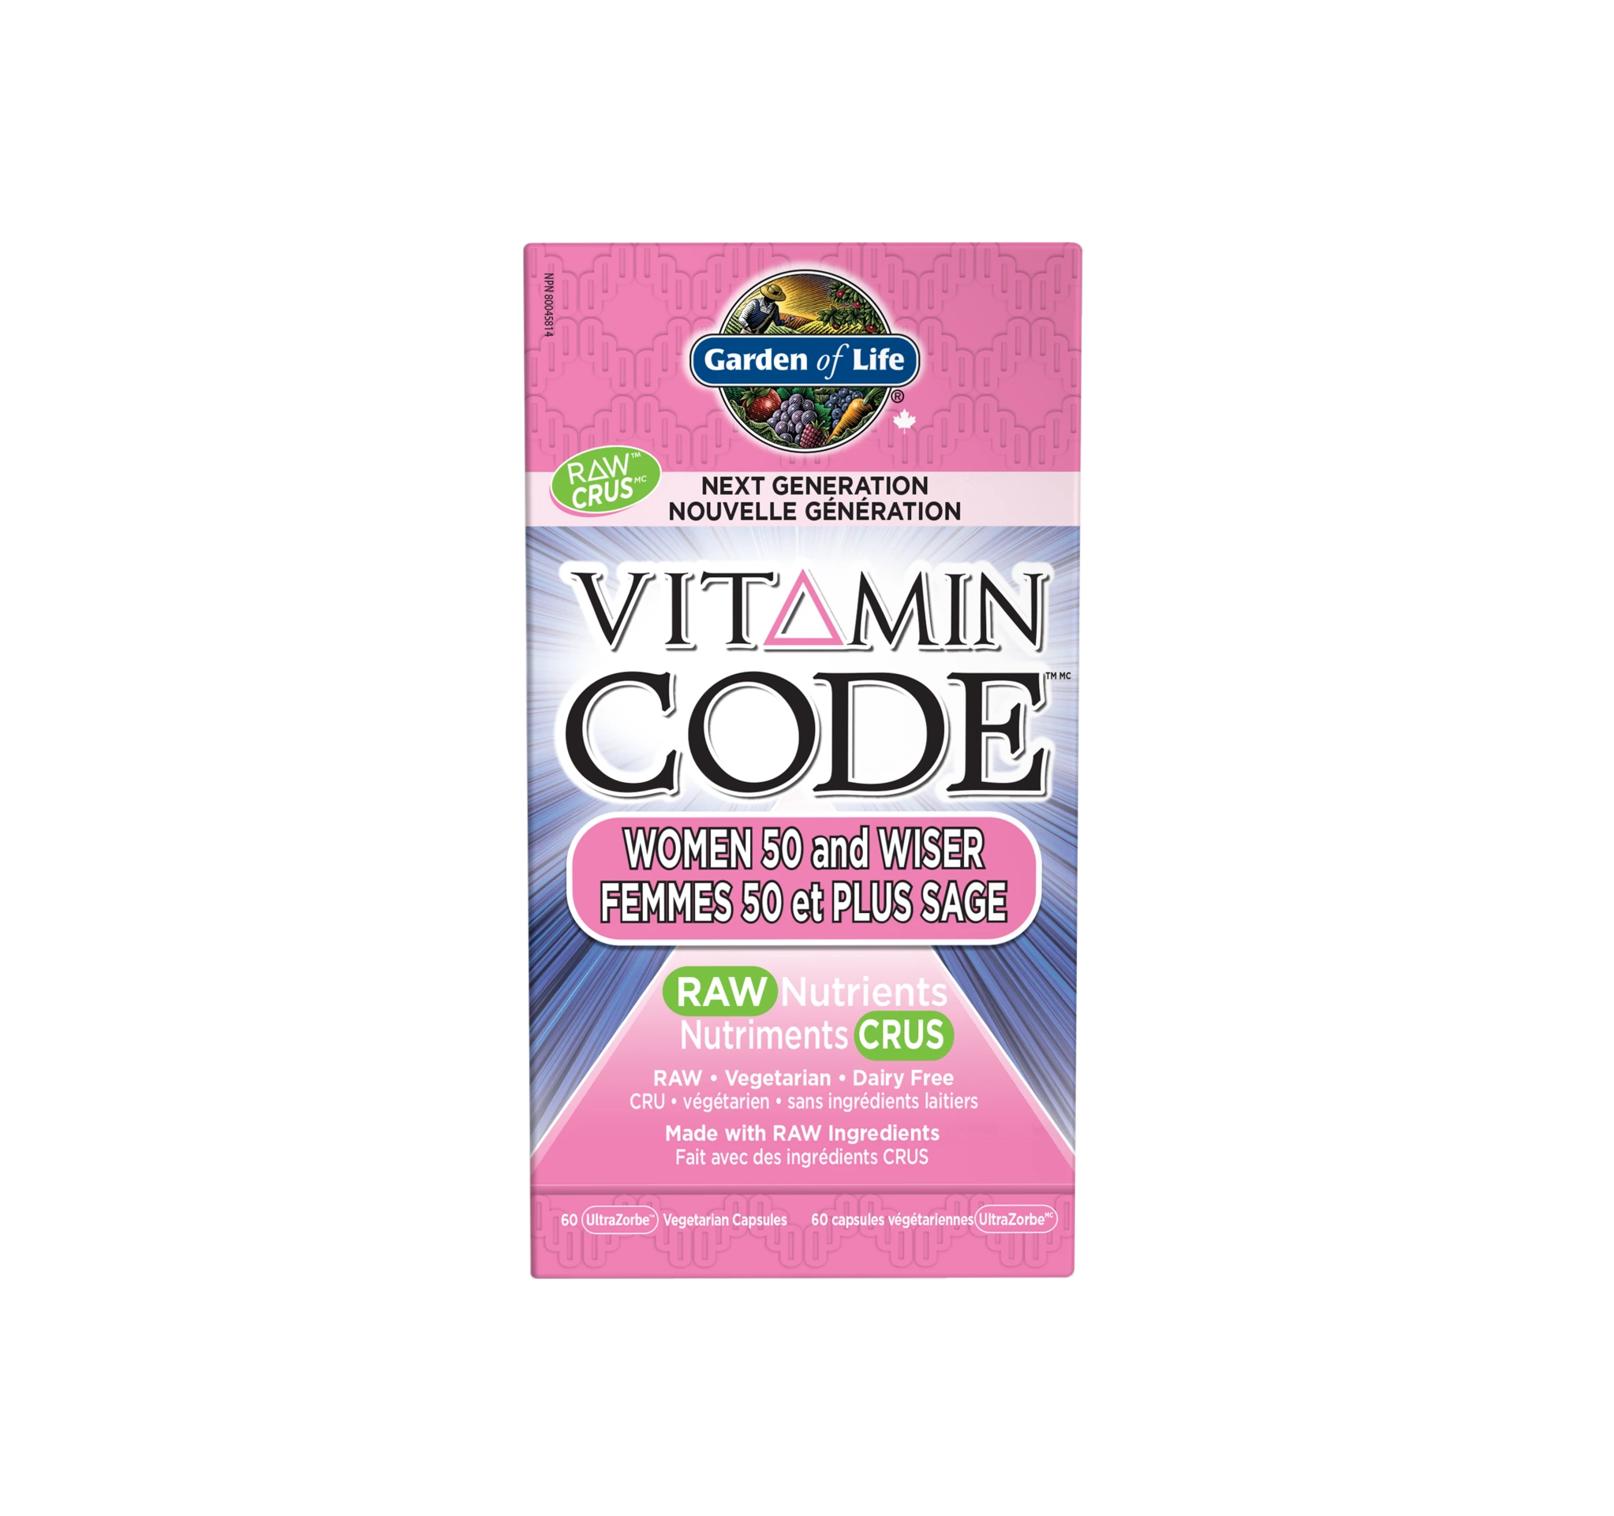 Garden of Life Vitamin Code Women 50 and Wiser 60 Ultrazorbe vegi caps